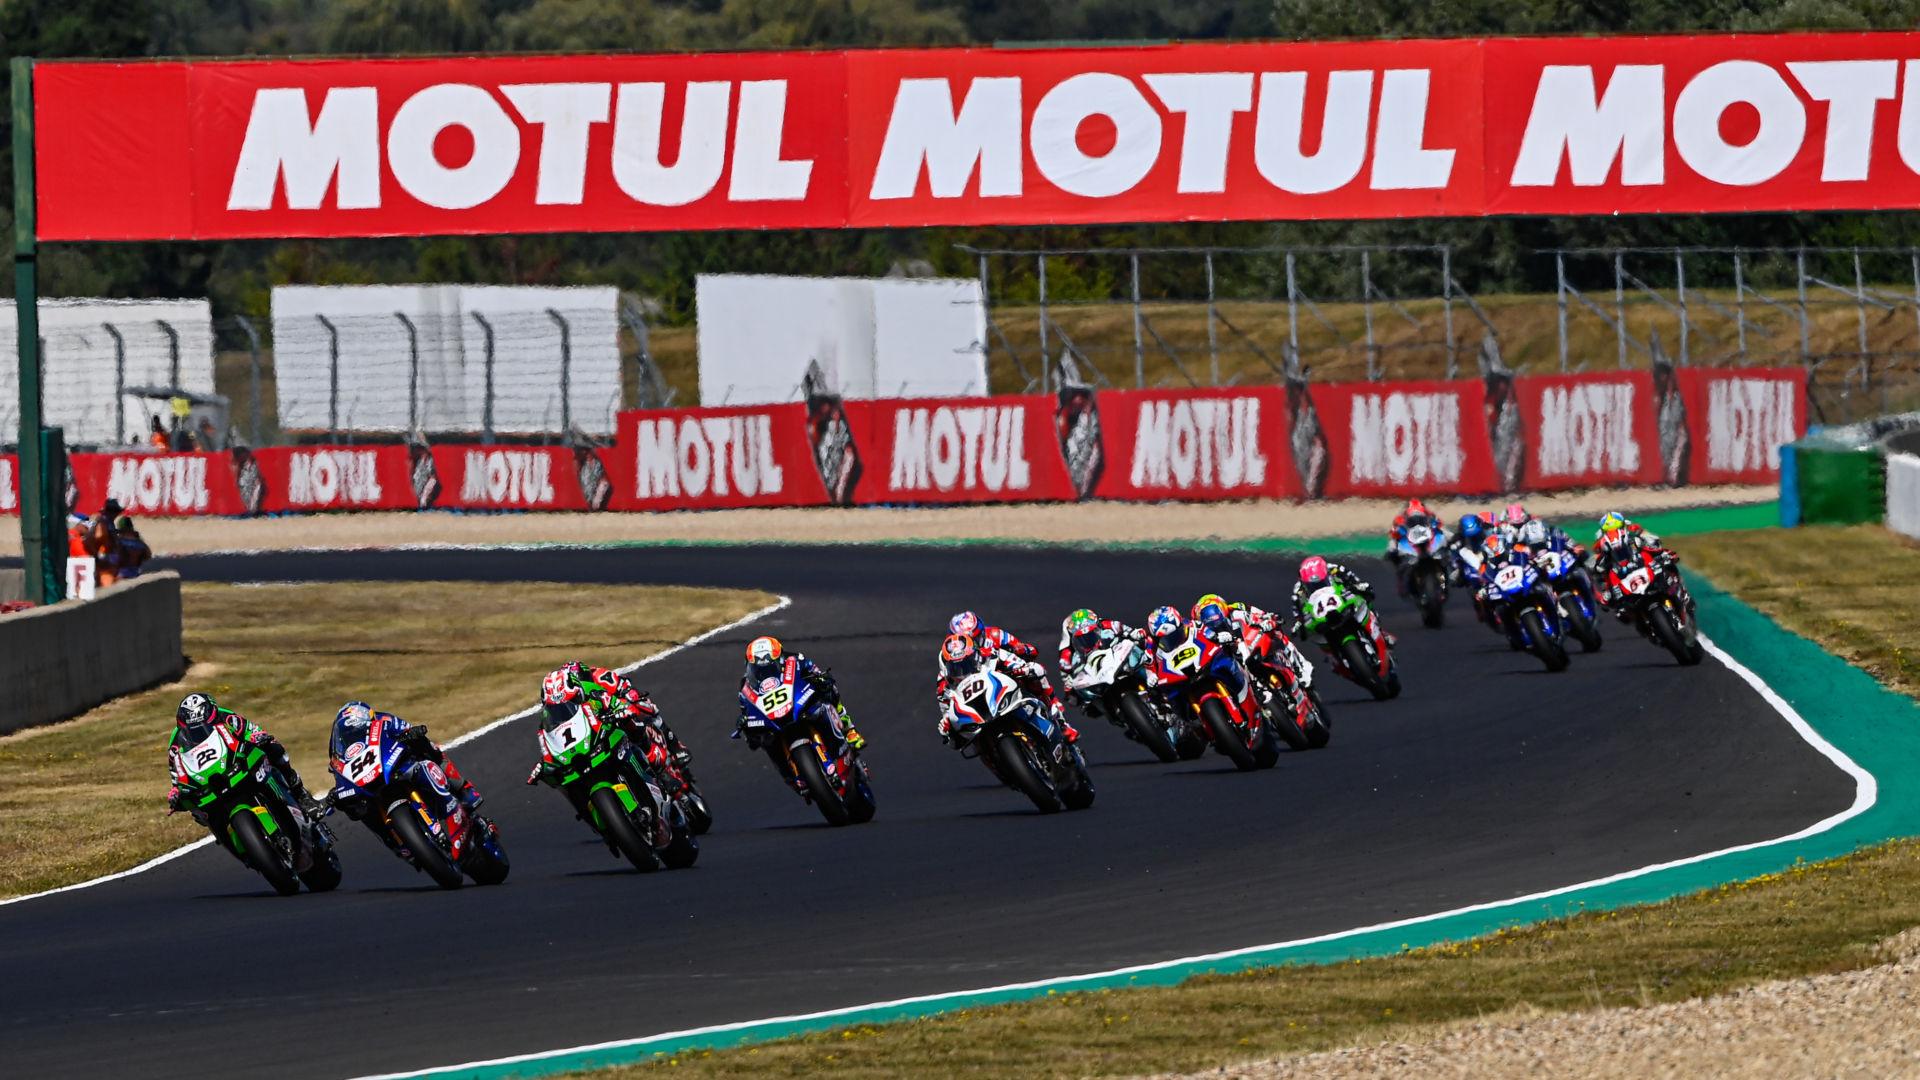 The 2021 FIM Superbike World Championship continues September 17-19 at Catalunya. Photo courtesy Dorna.